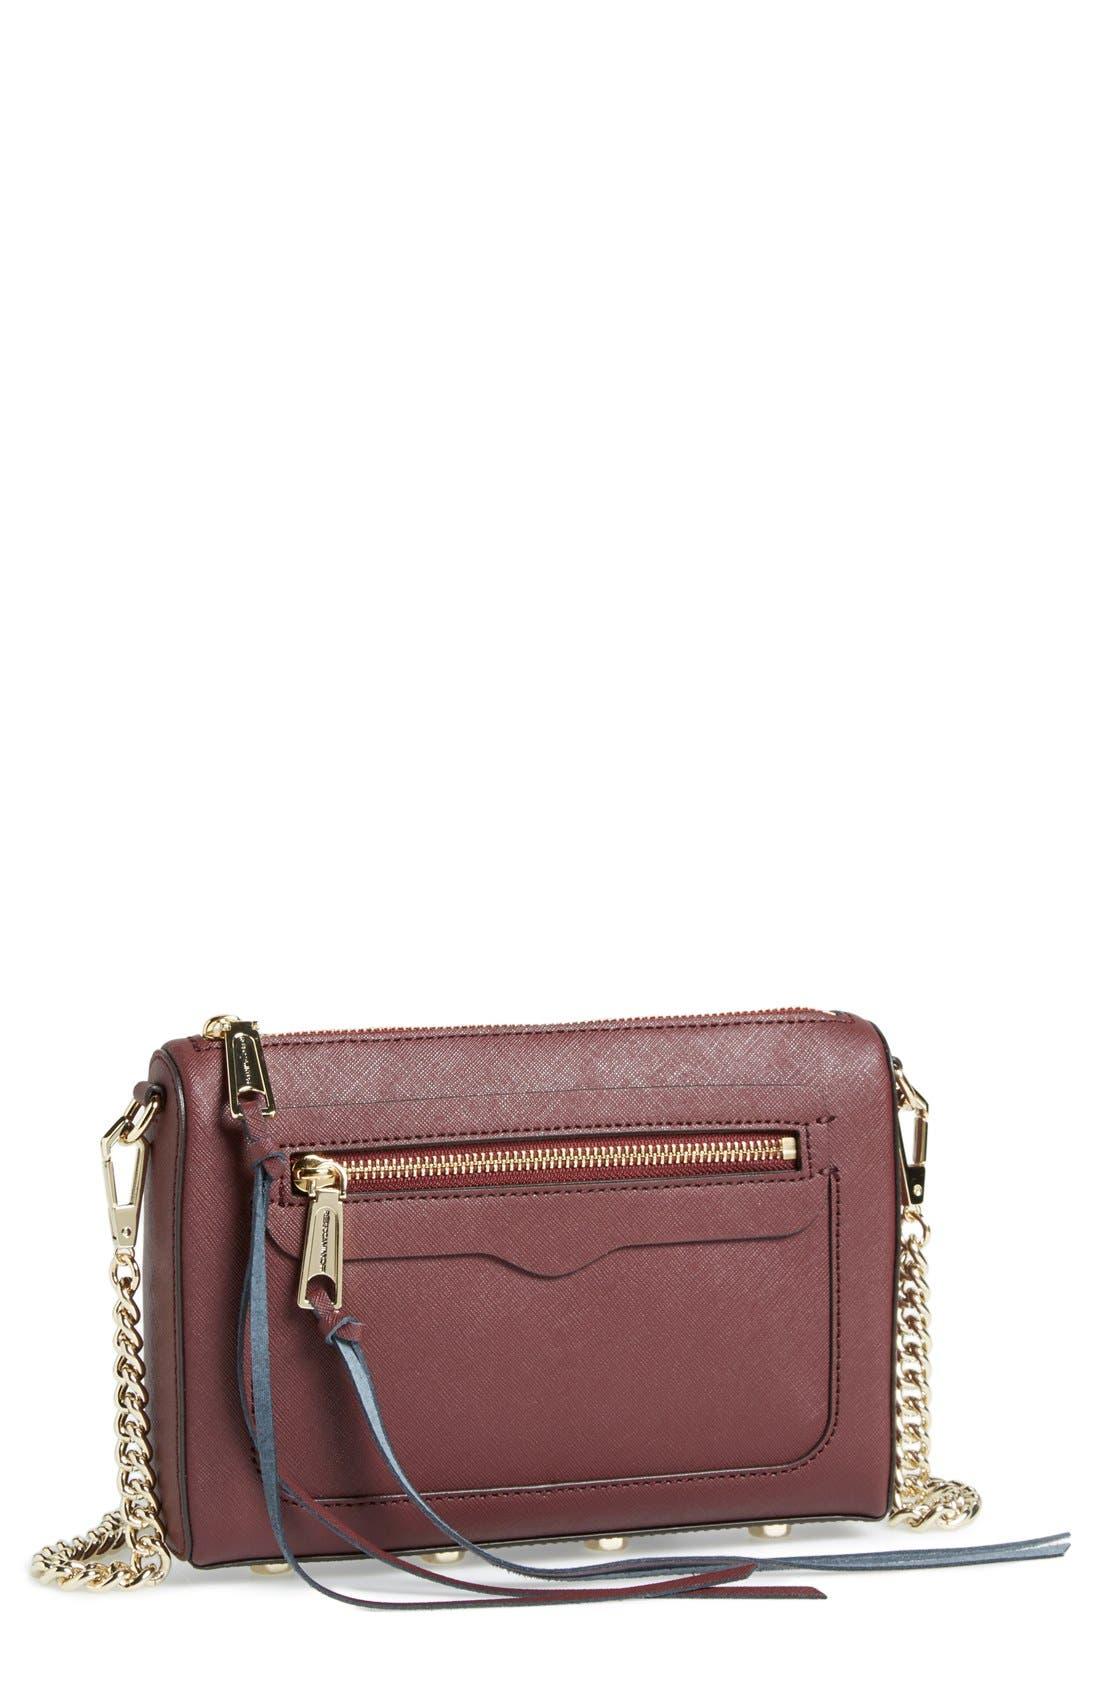 Alternate Image 1 Selected - Rebecca Minkoff 'Avery' Convertible Crossbody Bag